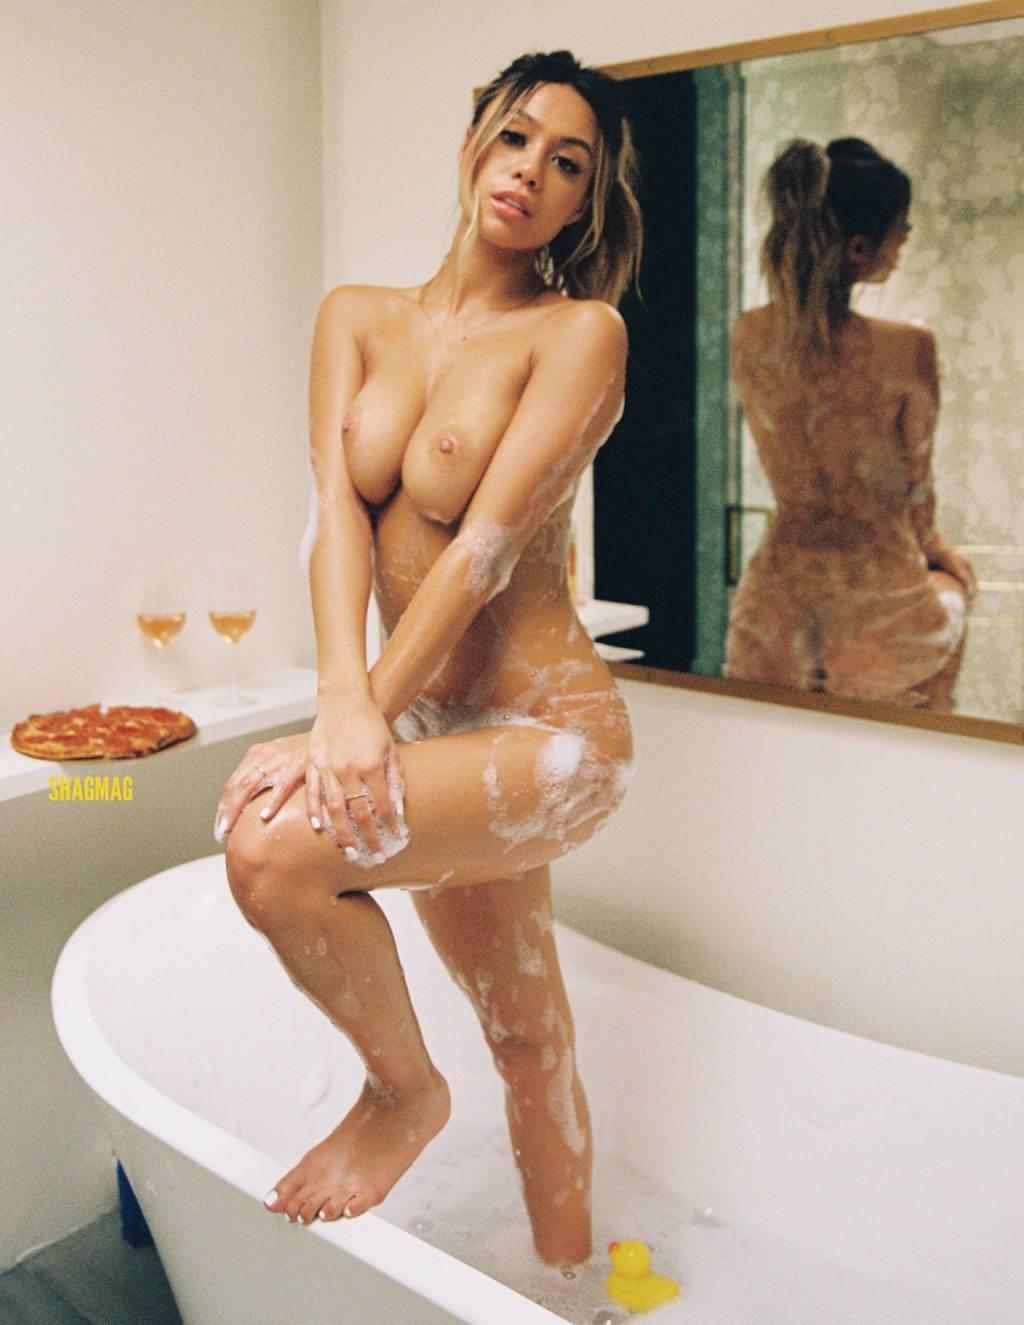 Desiree Schlotz Nude Onlyfans Leaked 0076